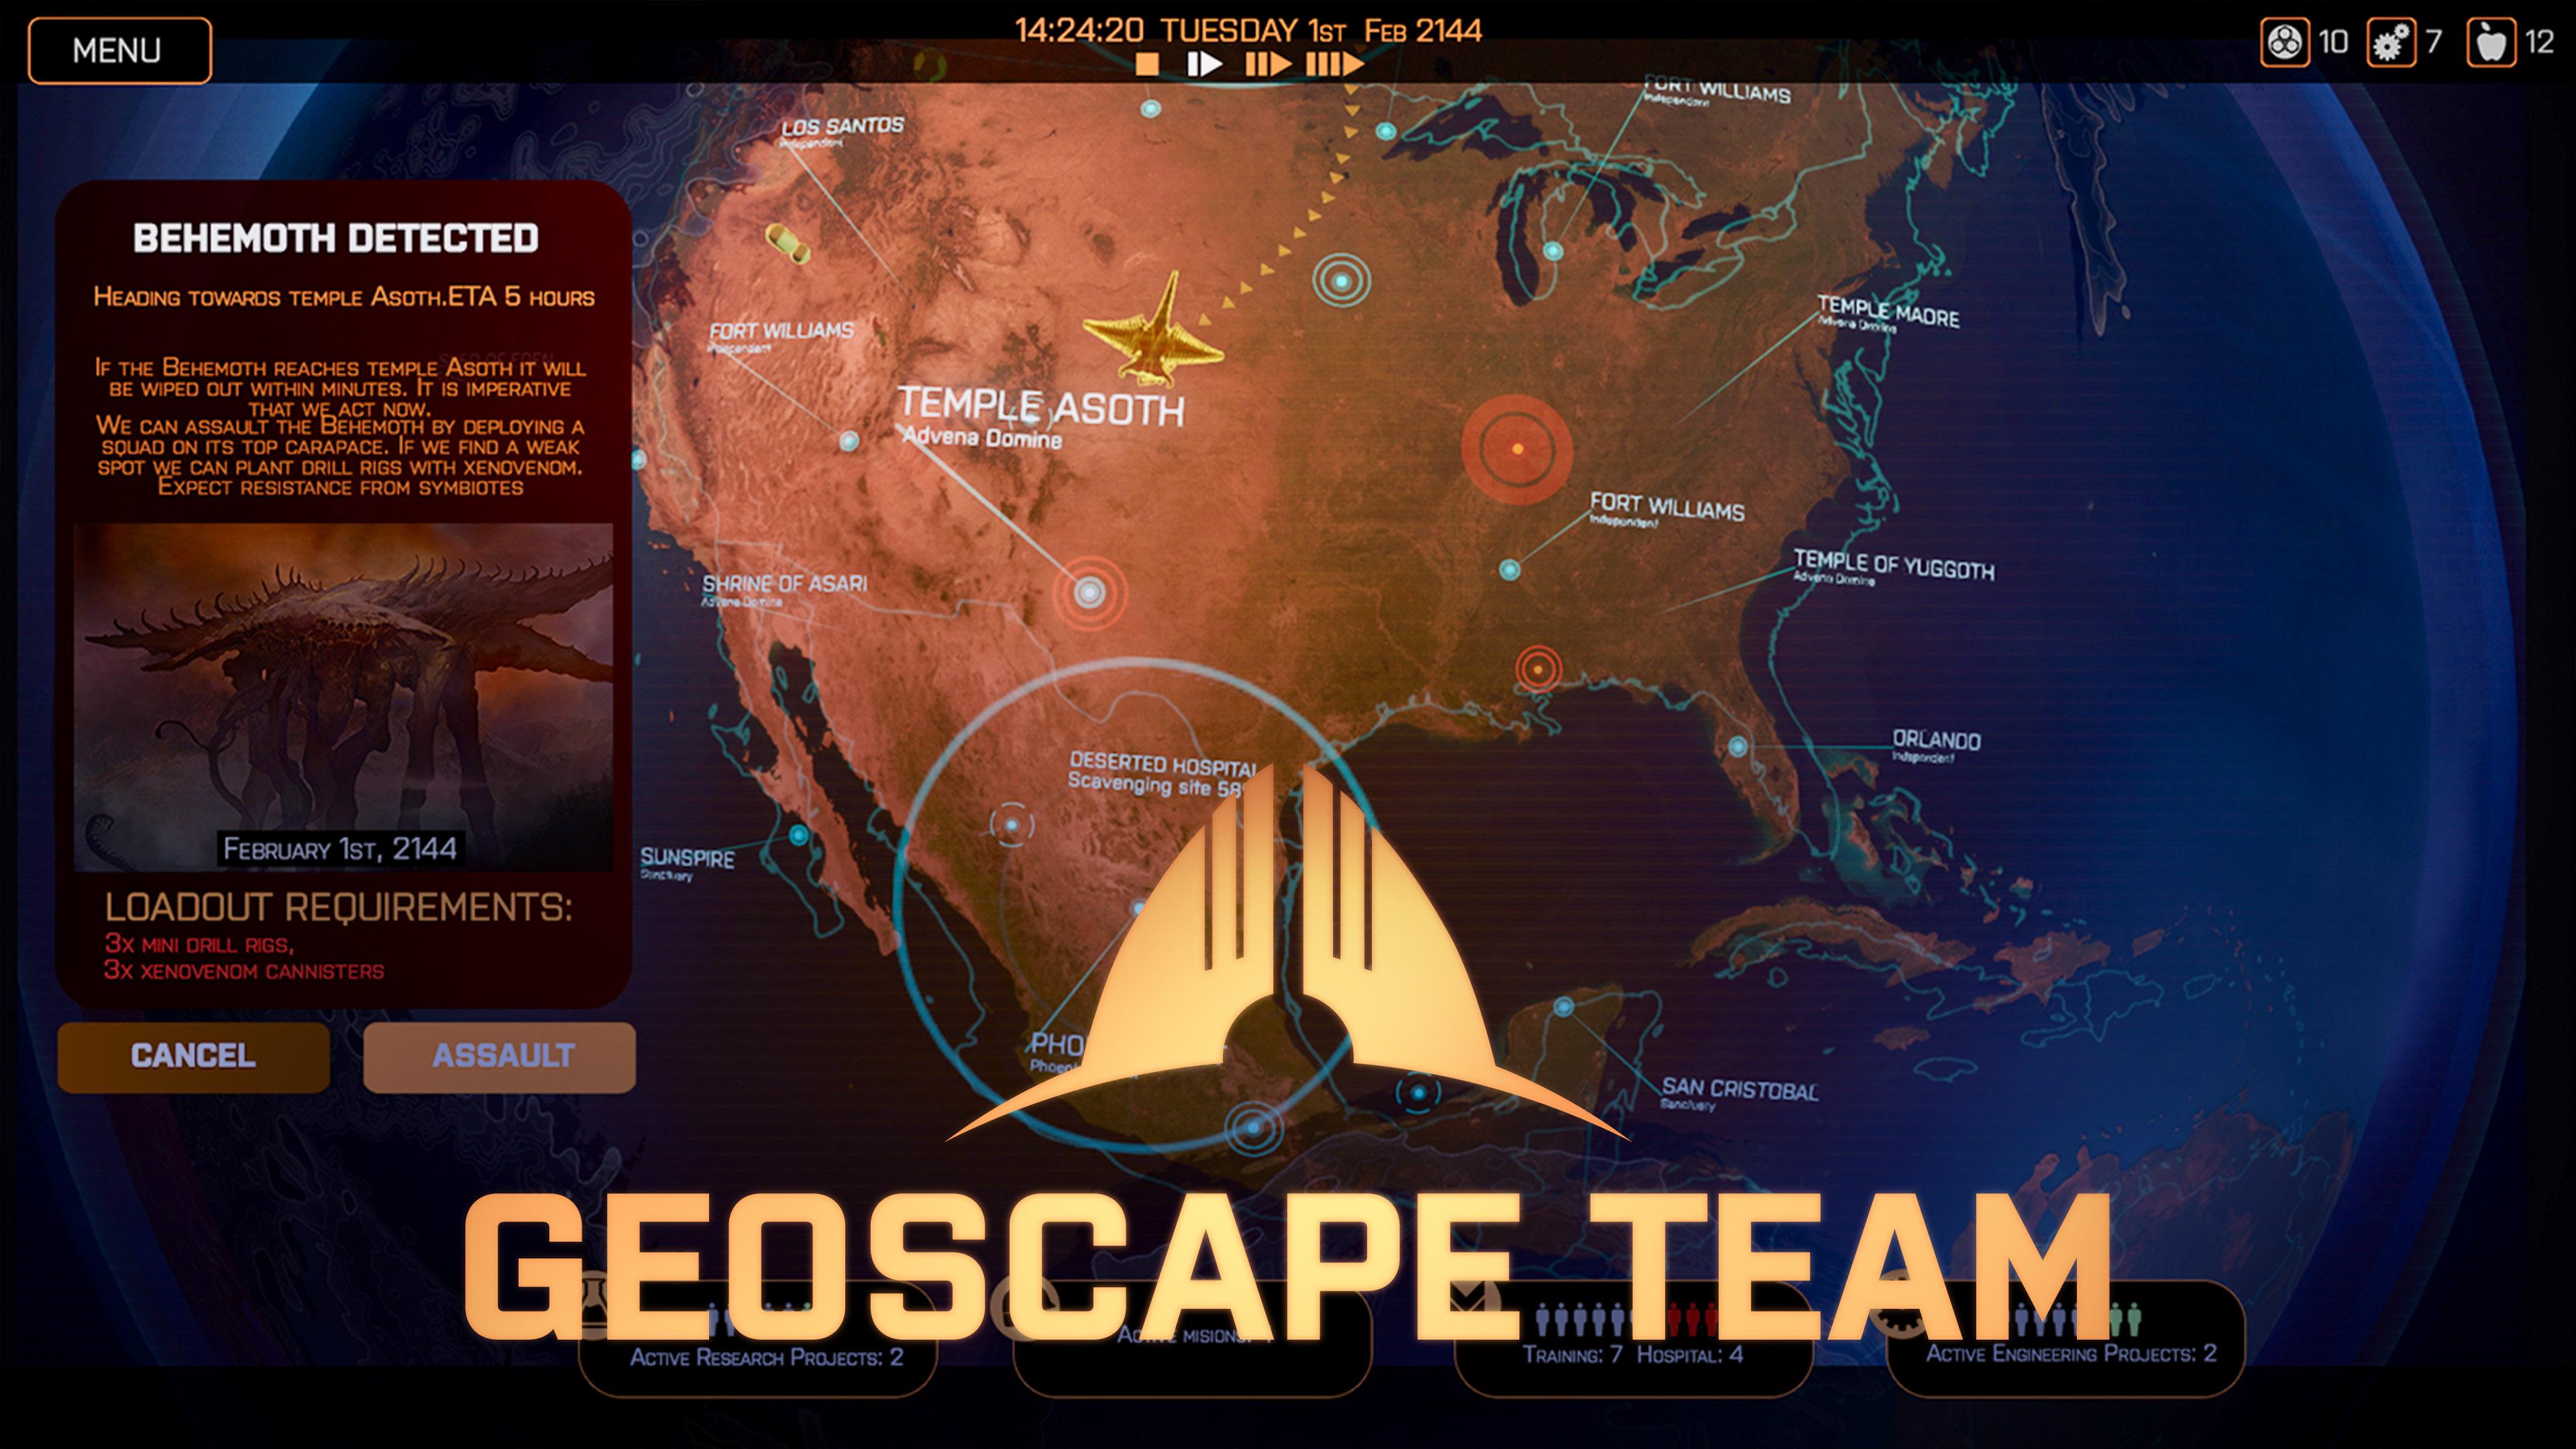 https://trello-attachments.s3.amazonaws.com/5b45bf69539628688a6ce911/5b506cfce6fcbea45cbd24f9/cbf779625eb11860618187f0fb9c0f1e/Geoscape_team.jpg